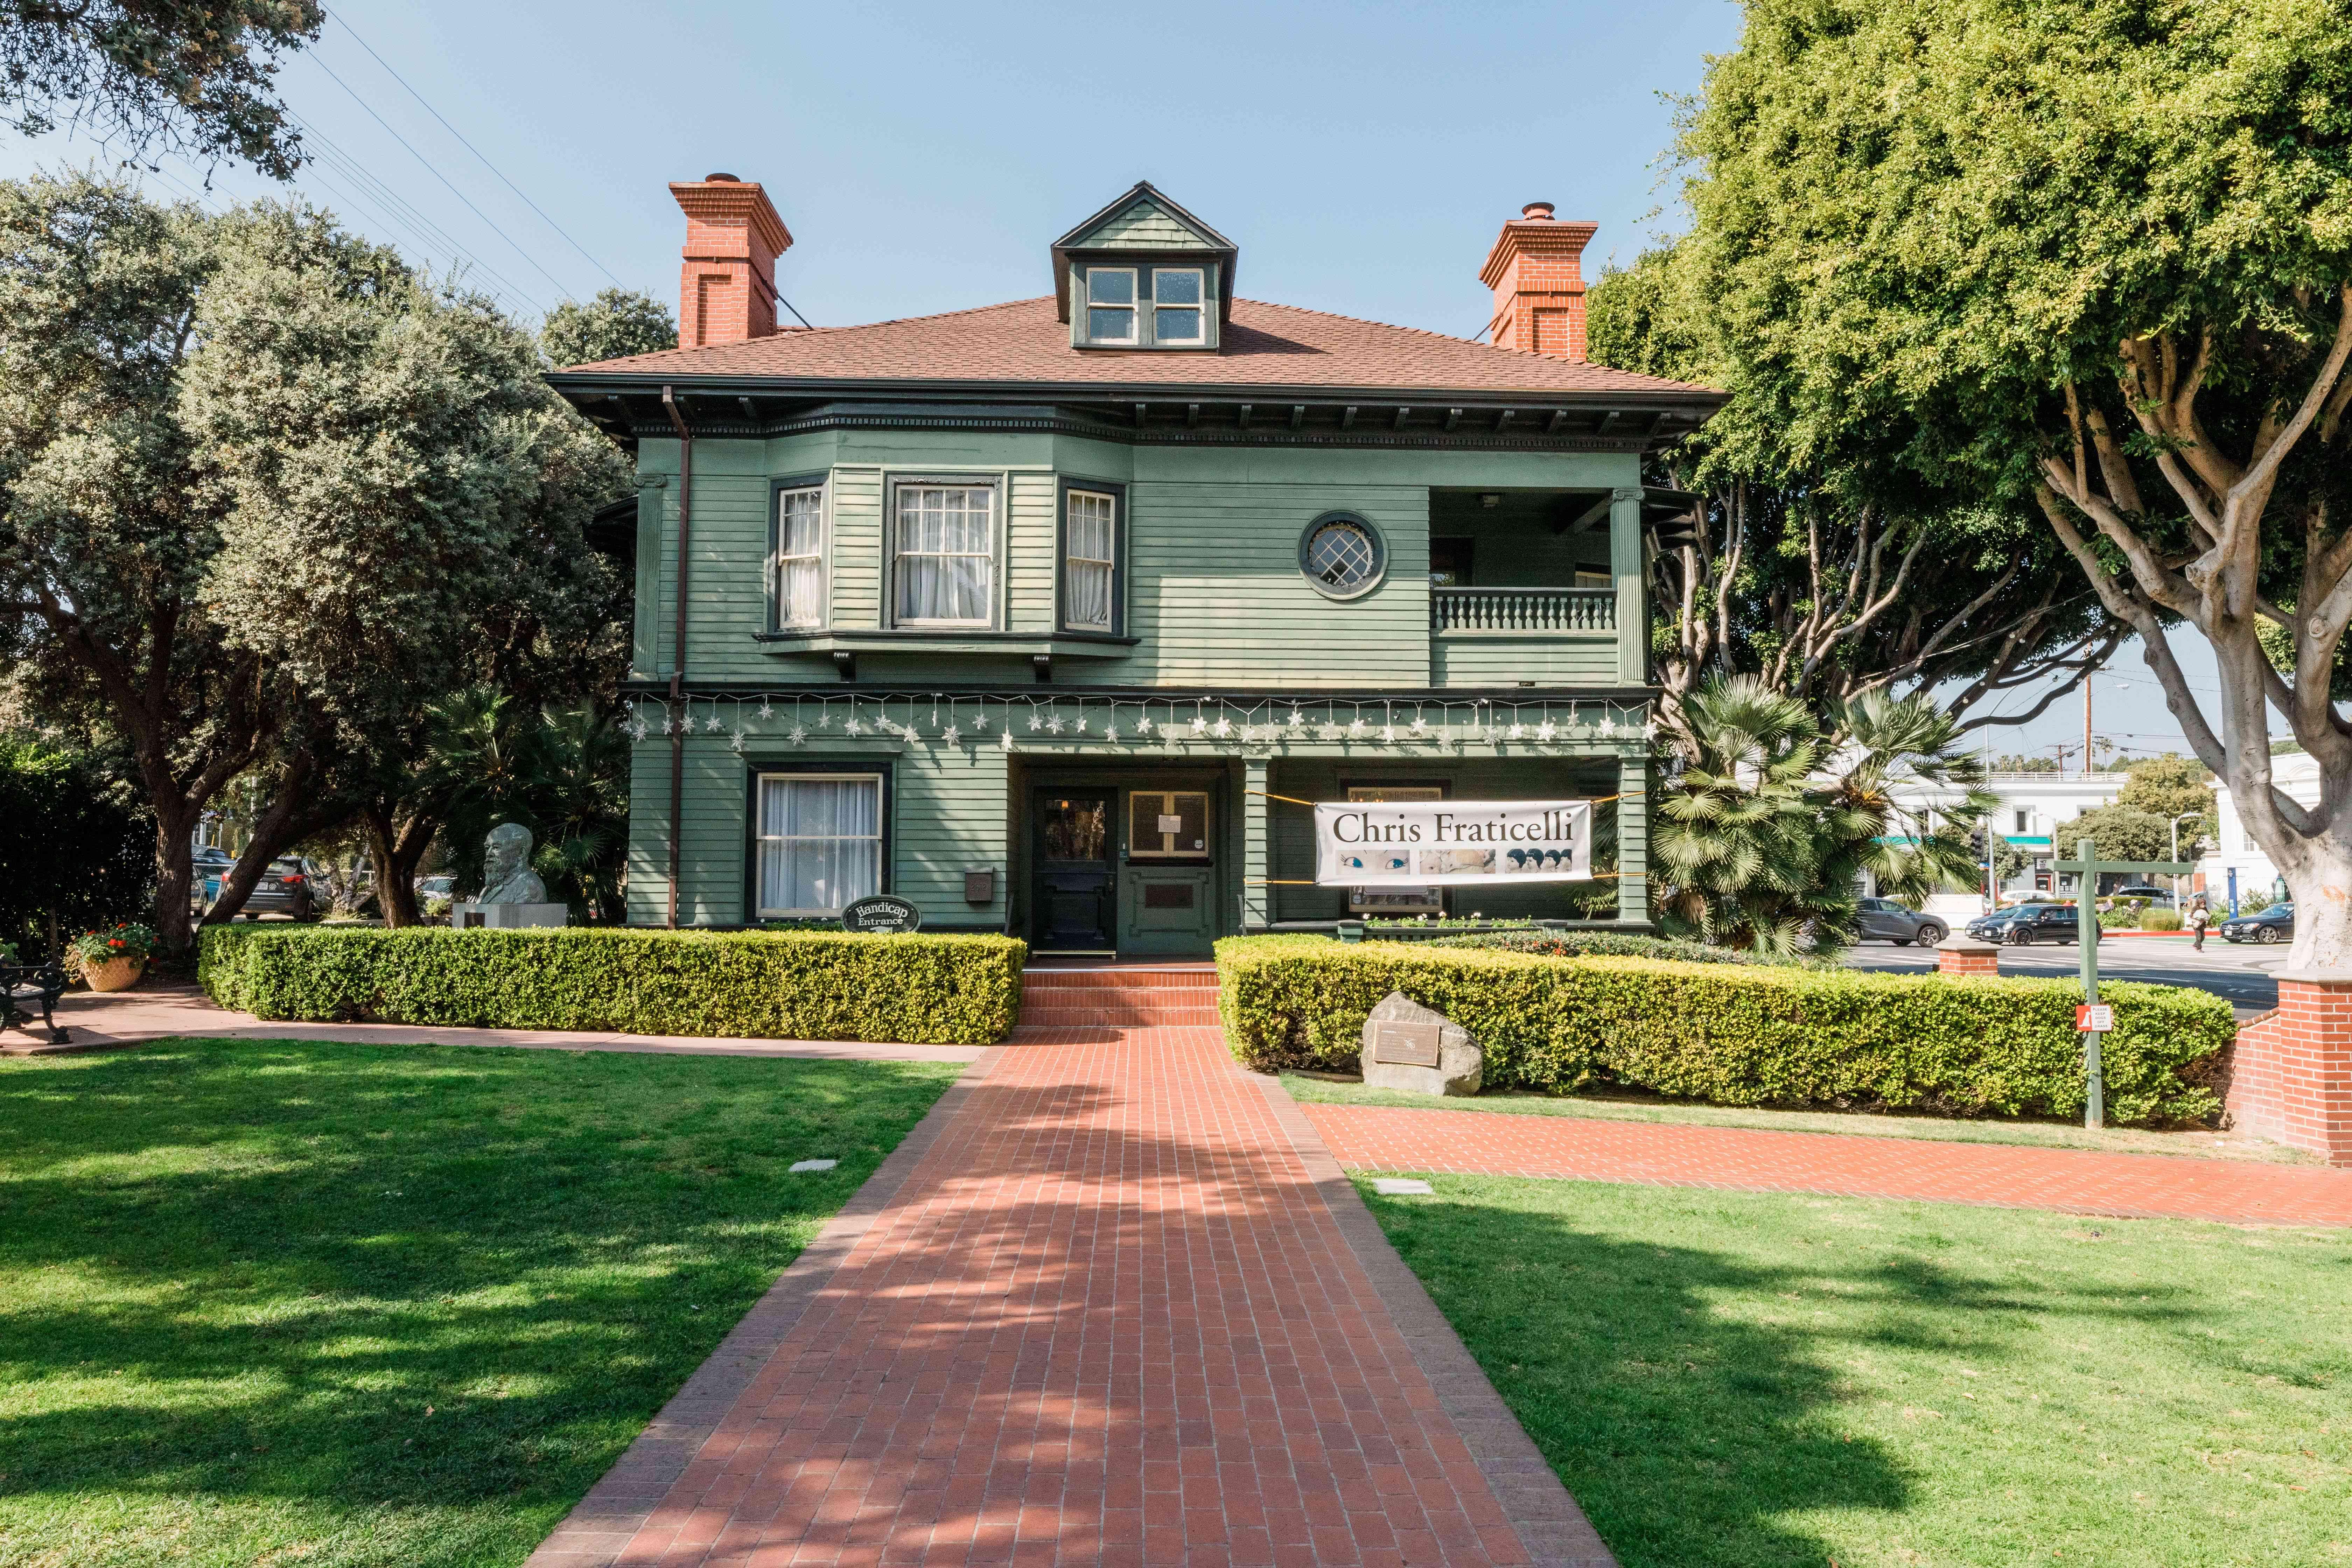 California Heritage Museum in Santa Monica